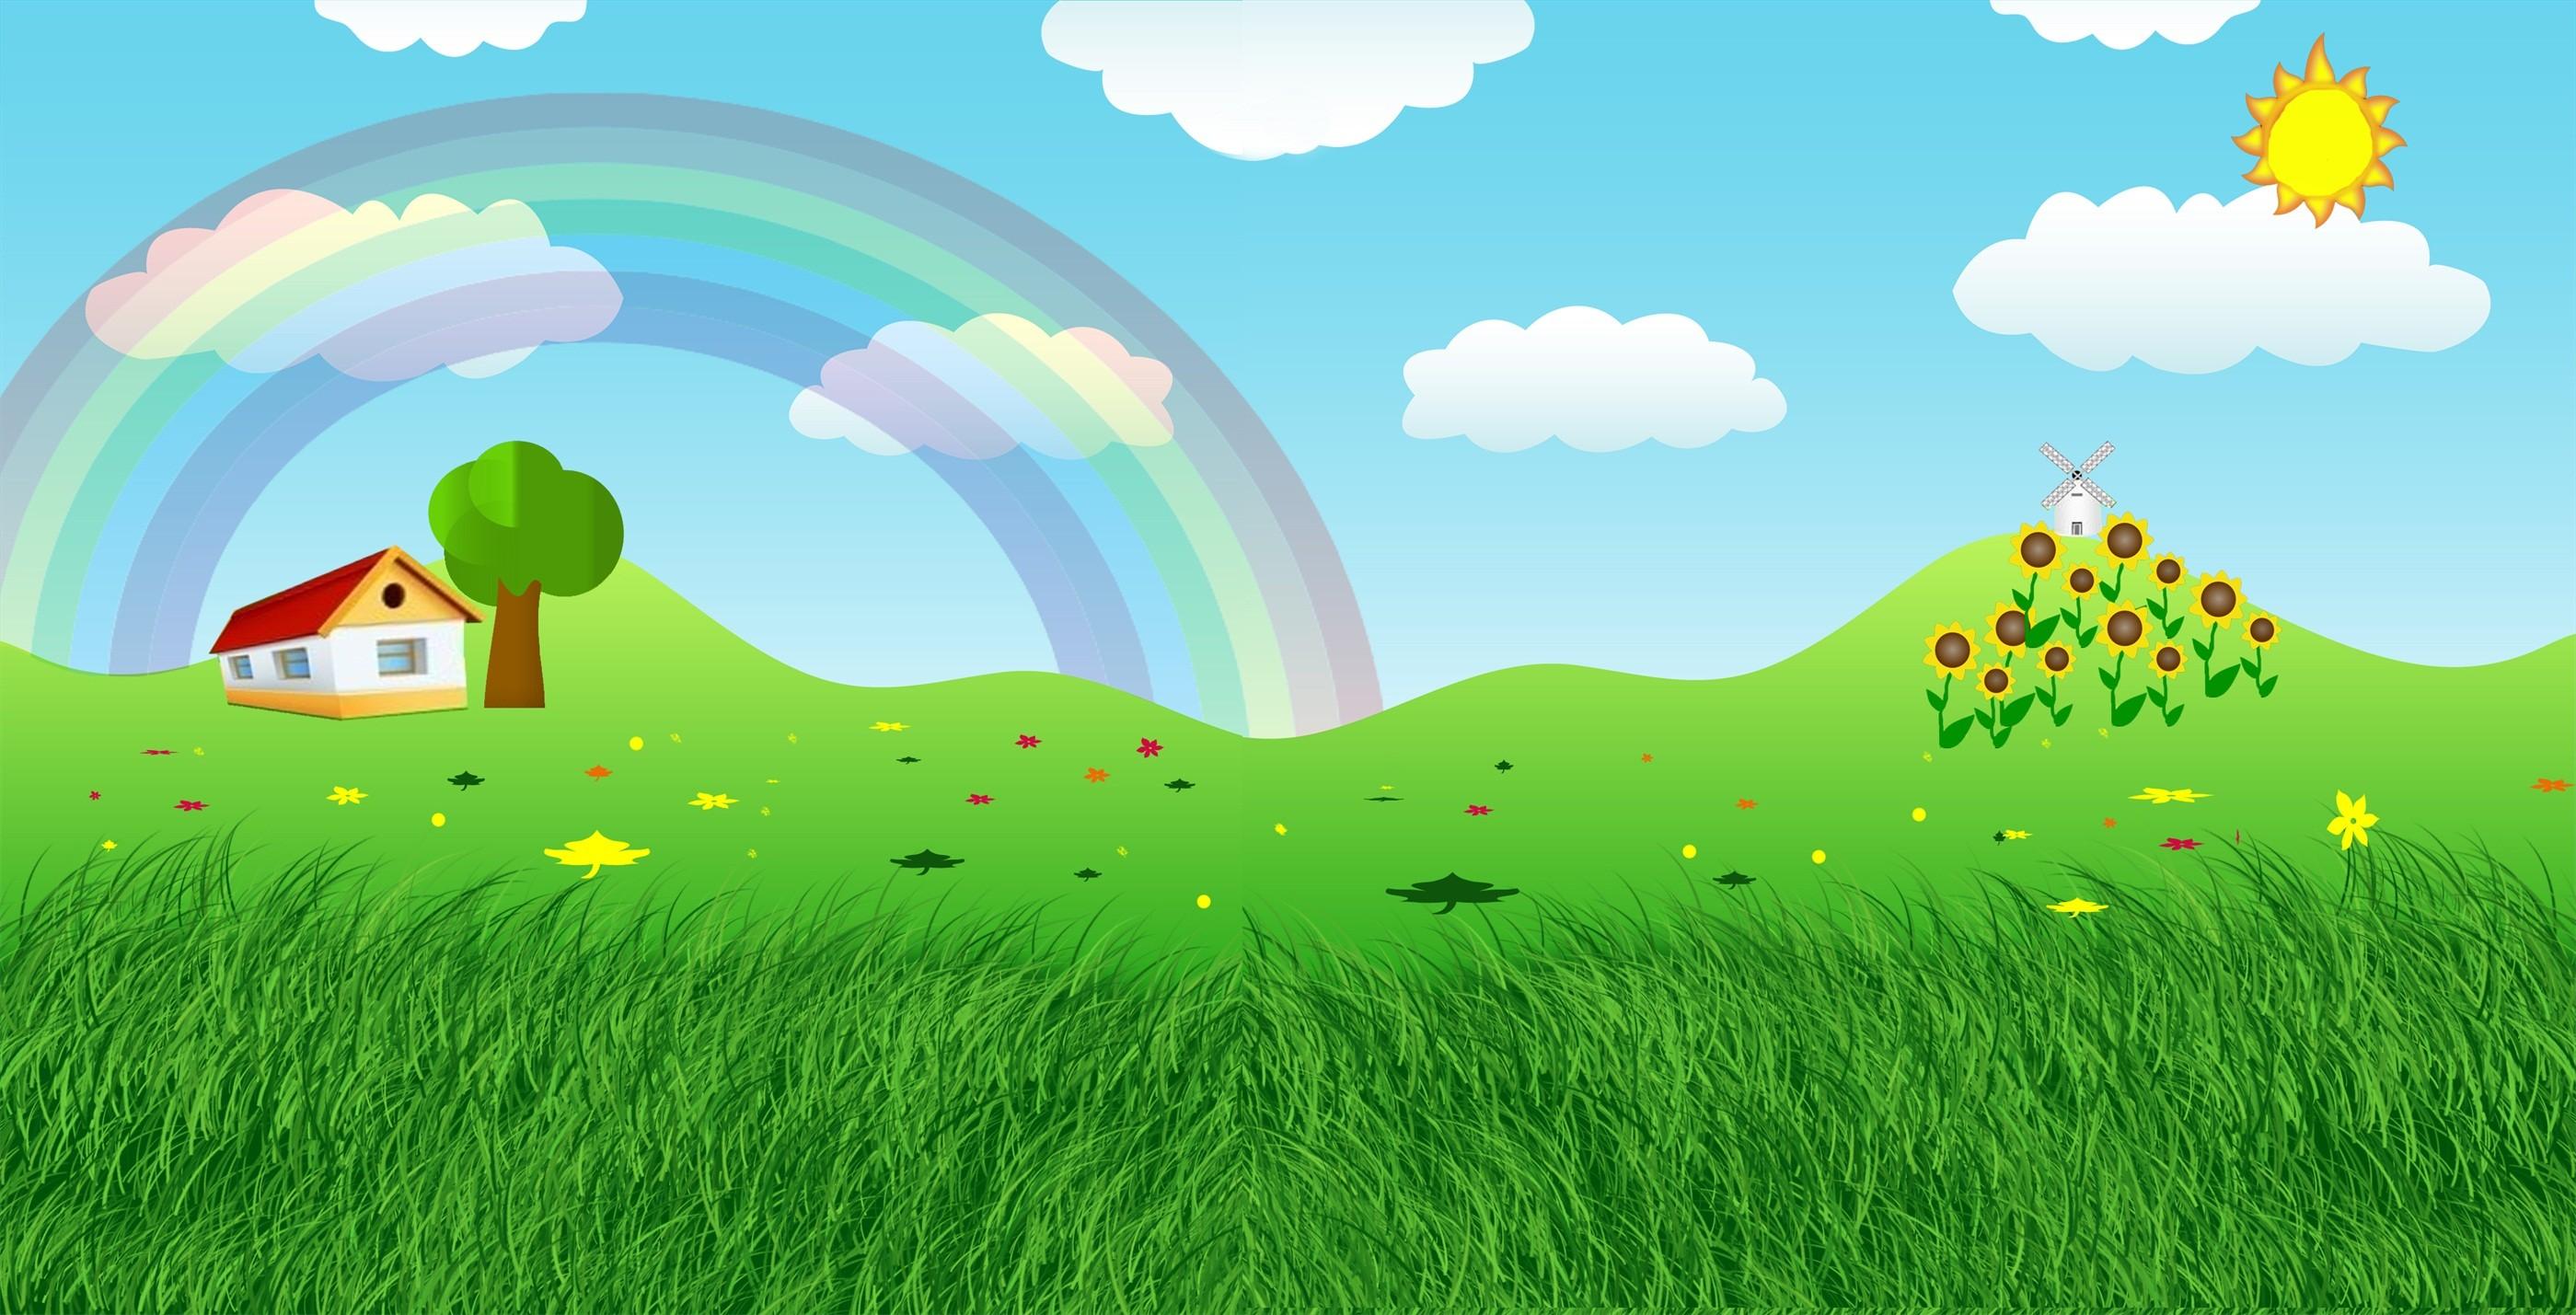 Desktop Wallpaper Hd 3d Full Screen Baby Kids Background 183 ① Download Free Amazing Hd Wallpapers For